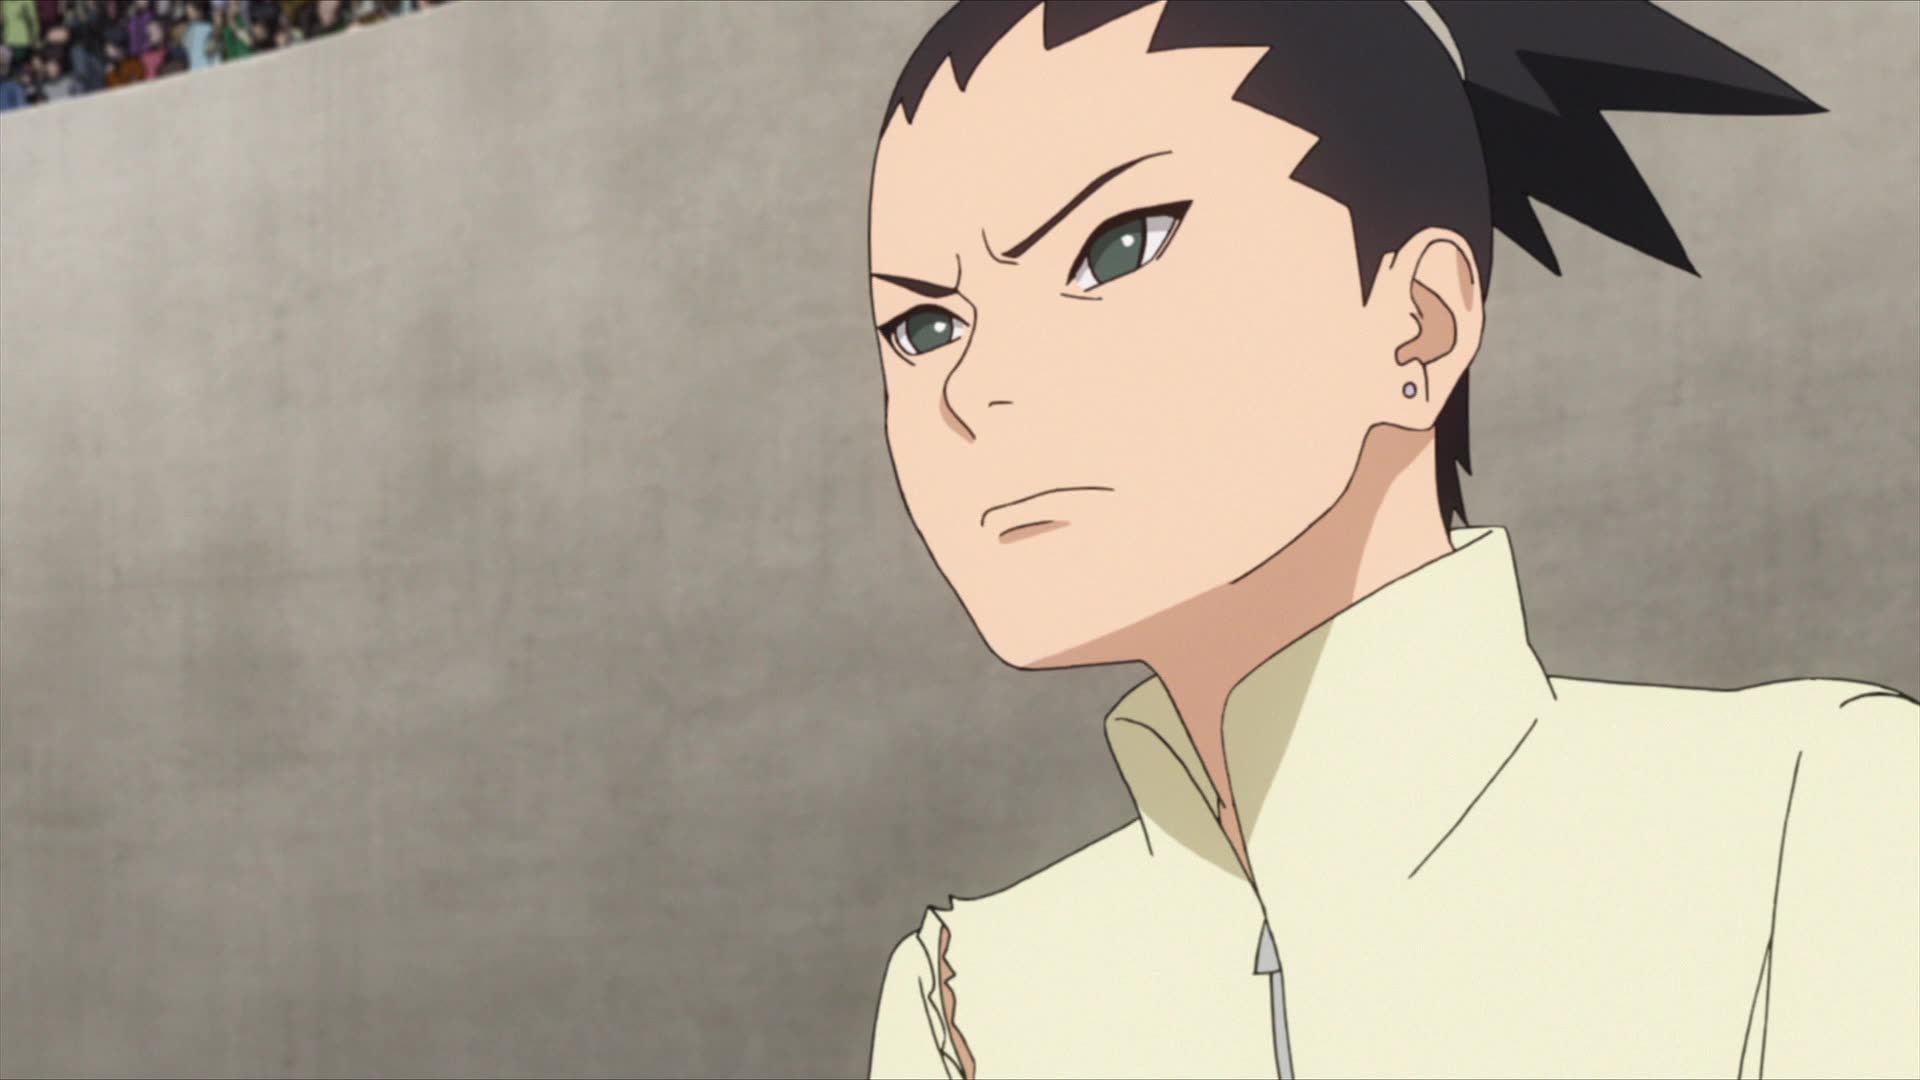 BORUTO: NARUTO NEXT GENERATIONS Episode 112, The Chunin Selection